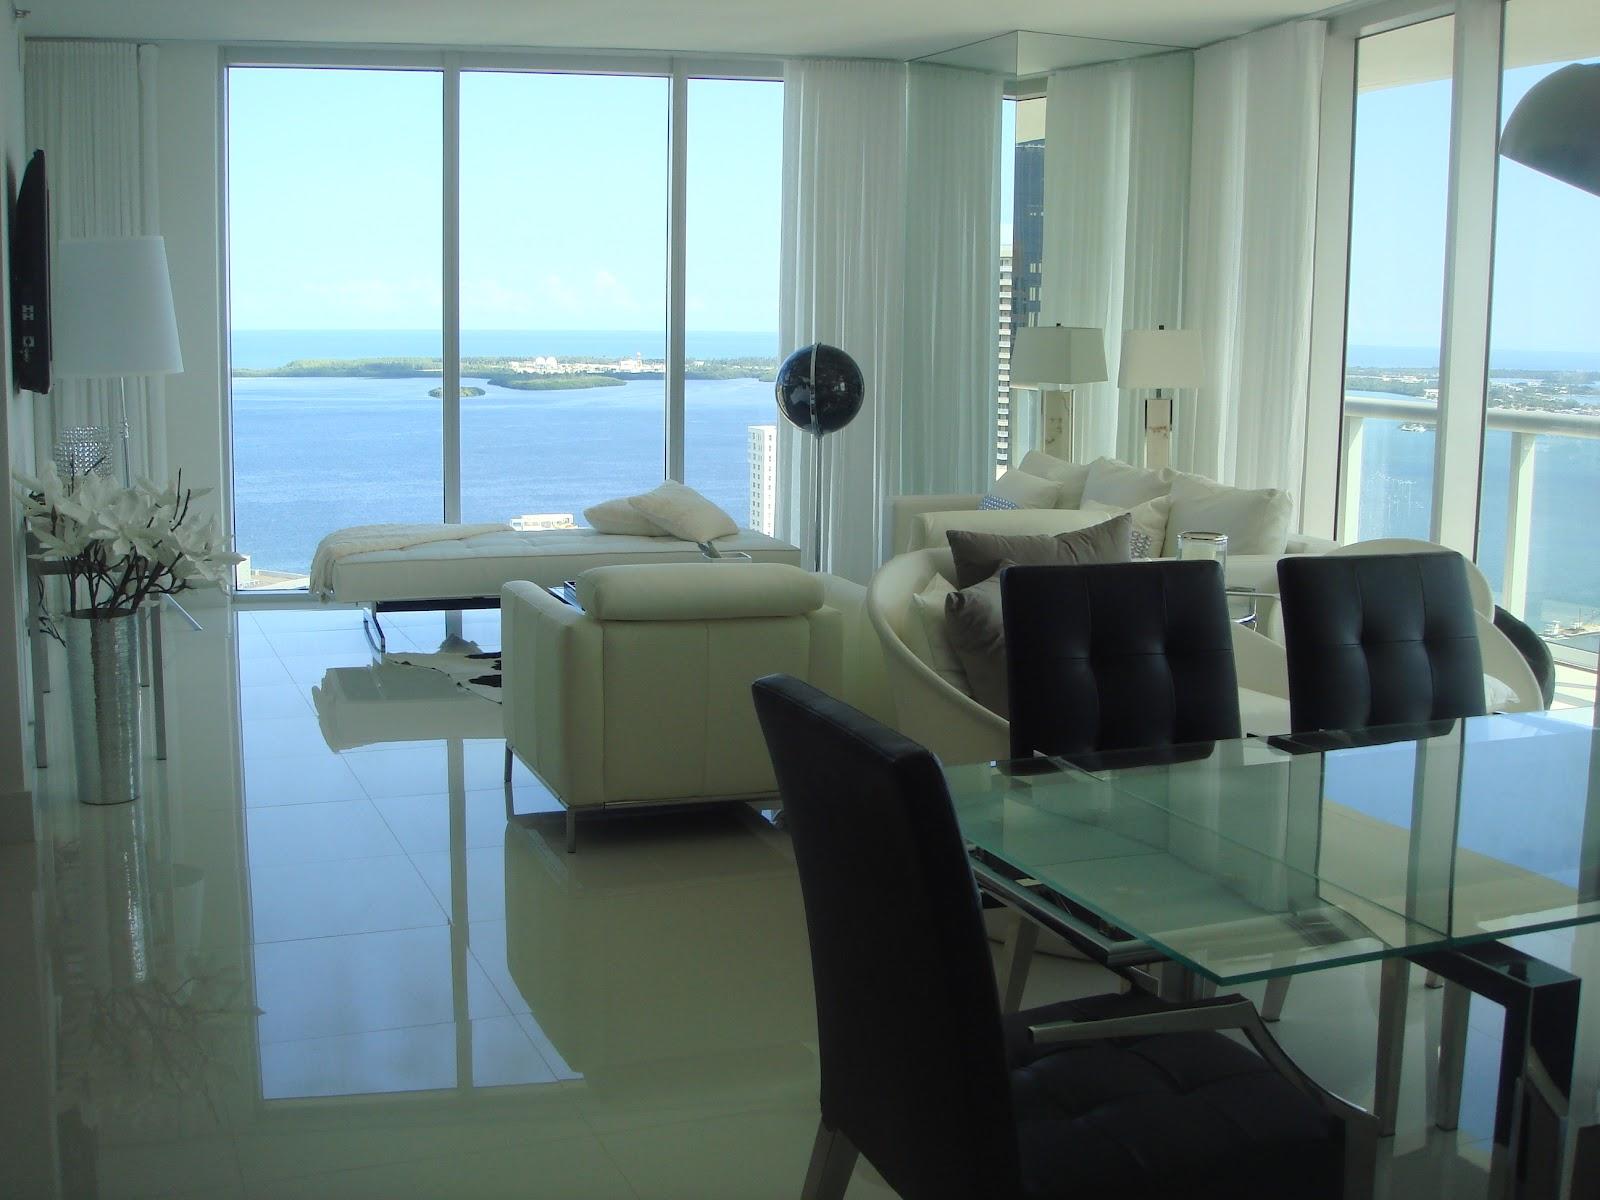 immobilier acheter investir et louer. Black Bedroom Furniture Sets. Home Design Ideas